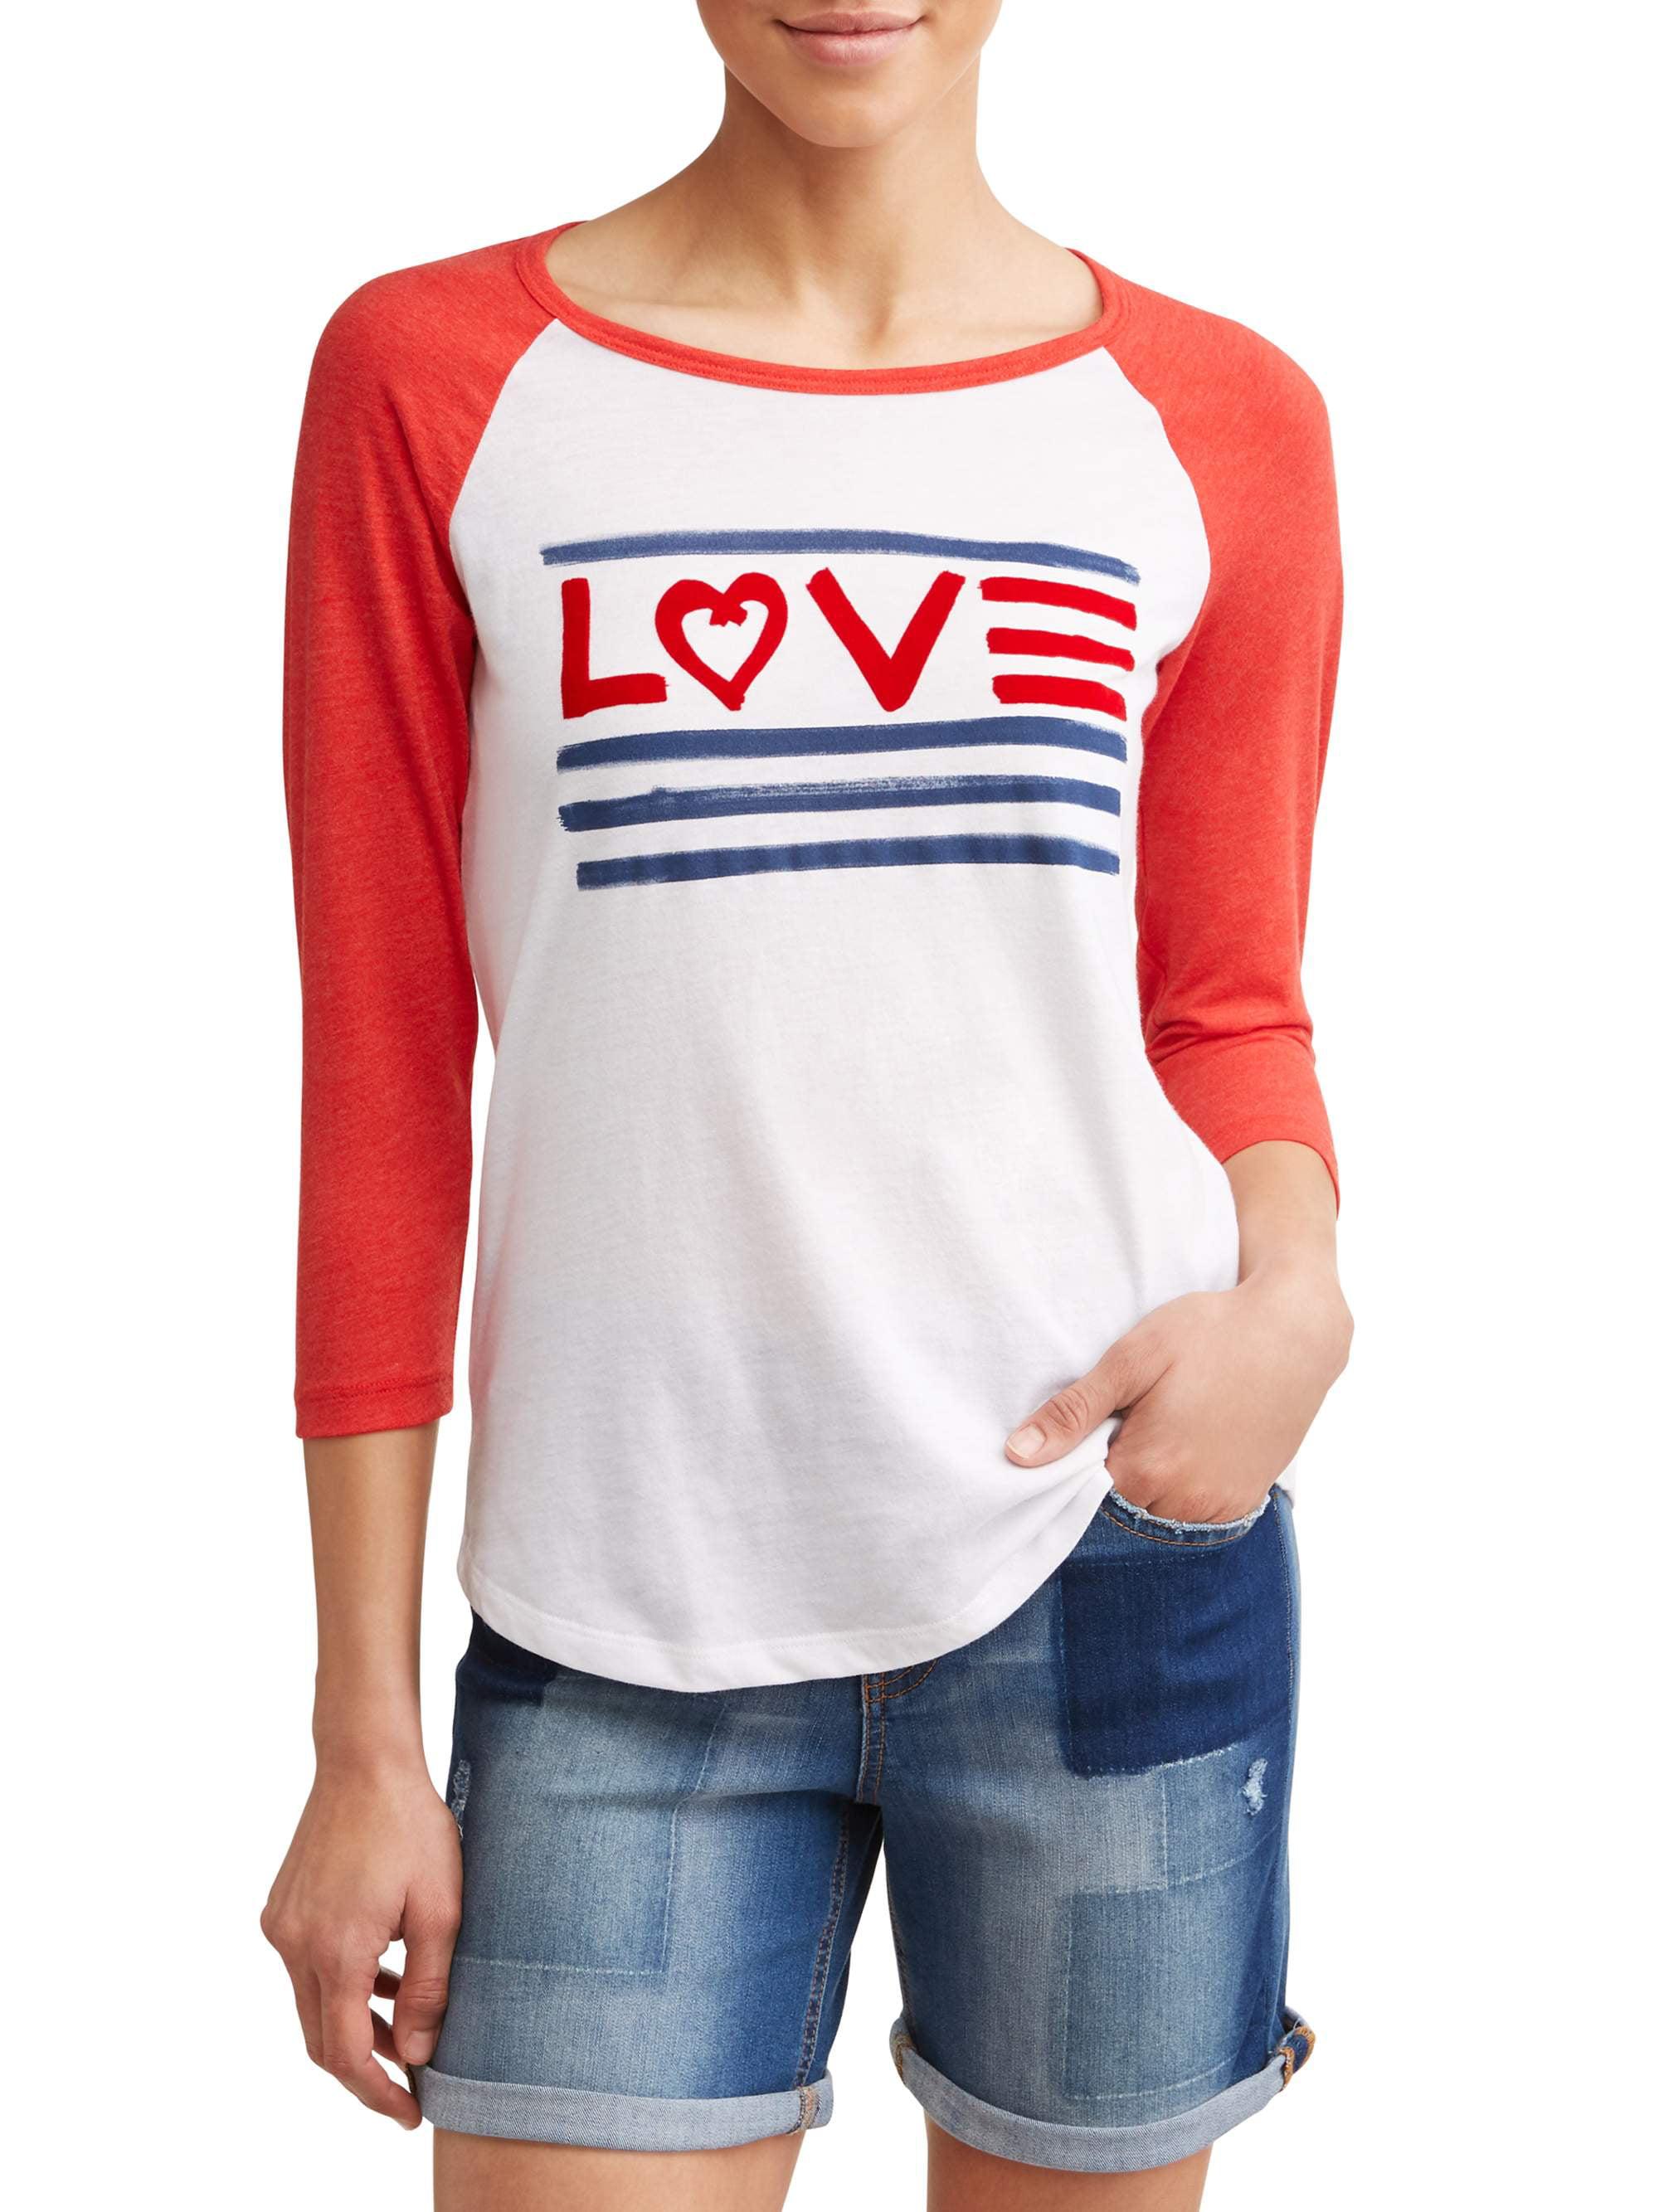 Love Flag 3/4 Sleeve Baseball Graphic Tee Women's